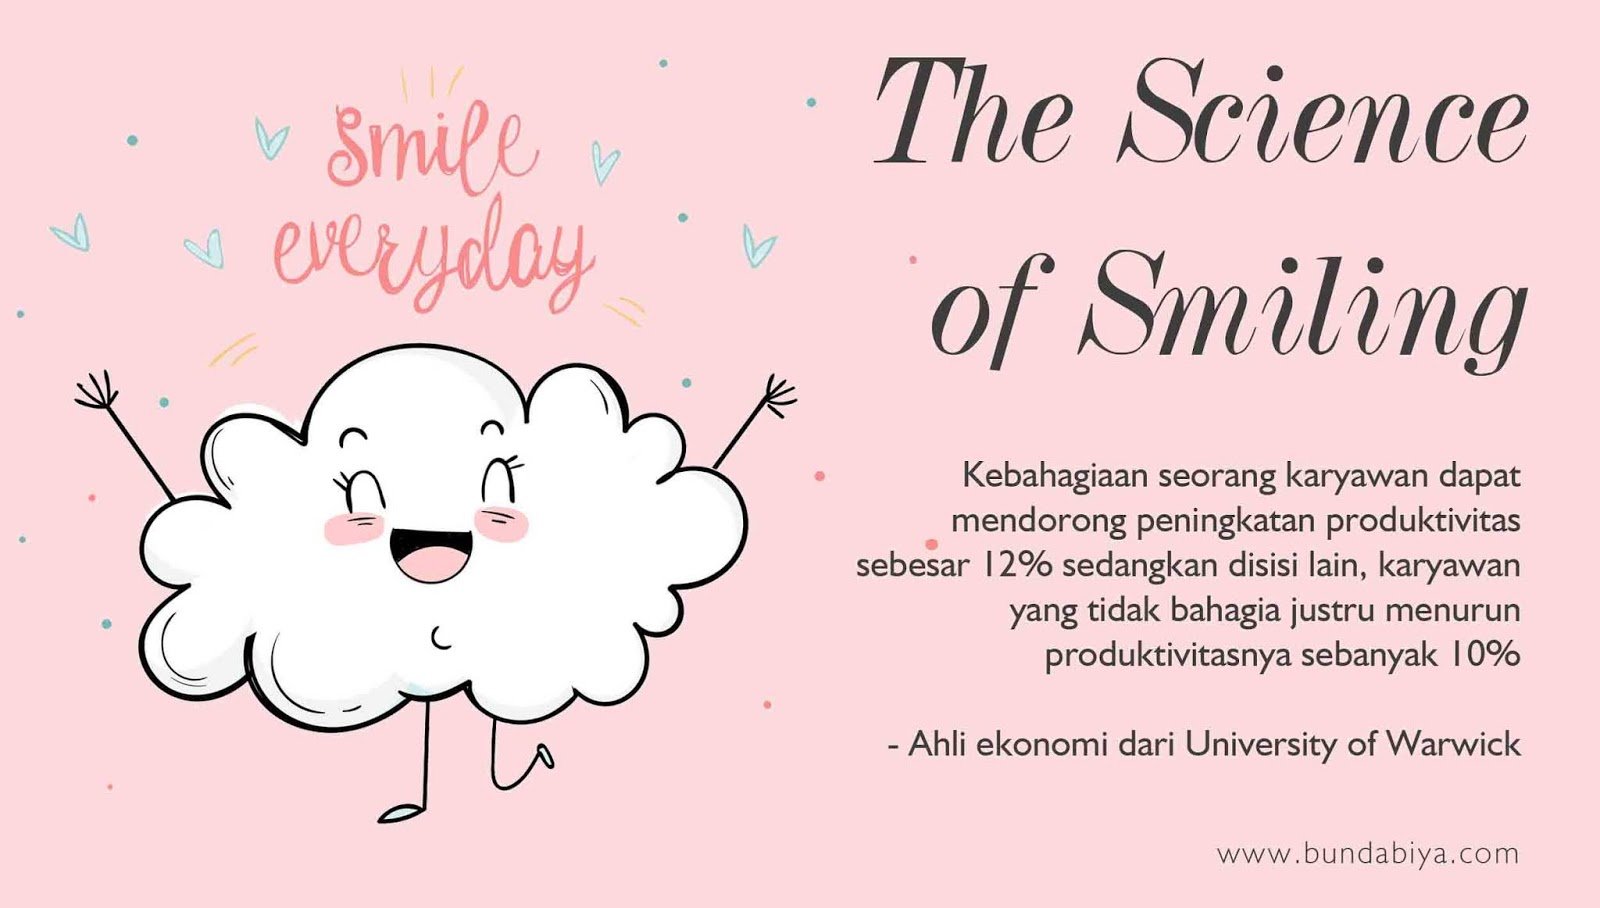 dental universe indonesia, klinik gigi bagus, klinik gigi murah, klinik gigi di jakarta, cara merawat gigi, manfaat tersenyum, penelitian tentang senyum, cantik masa kini